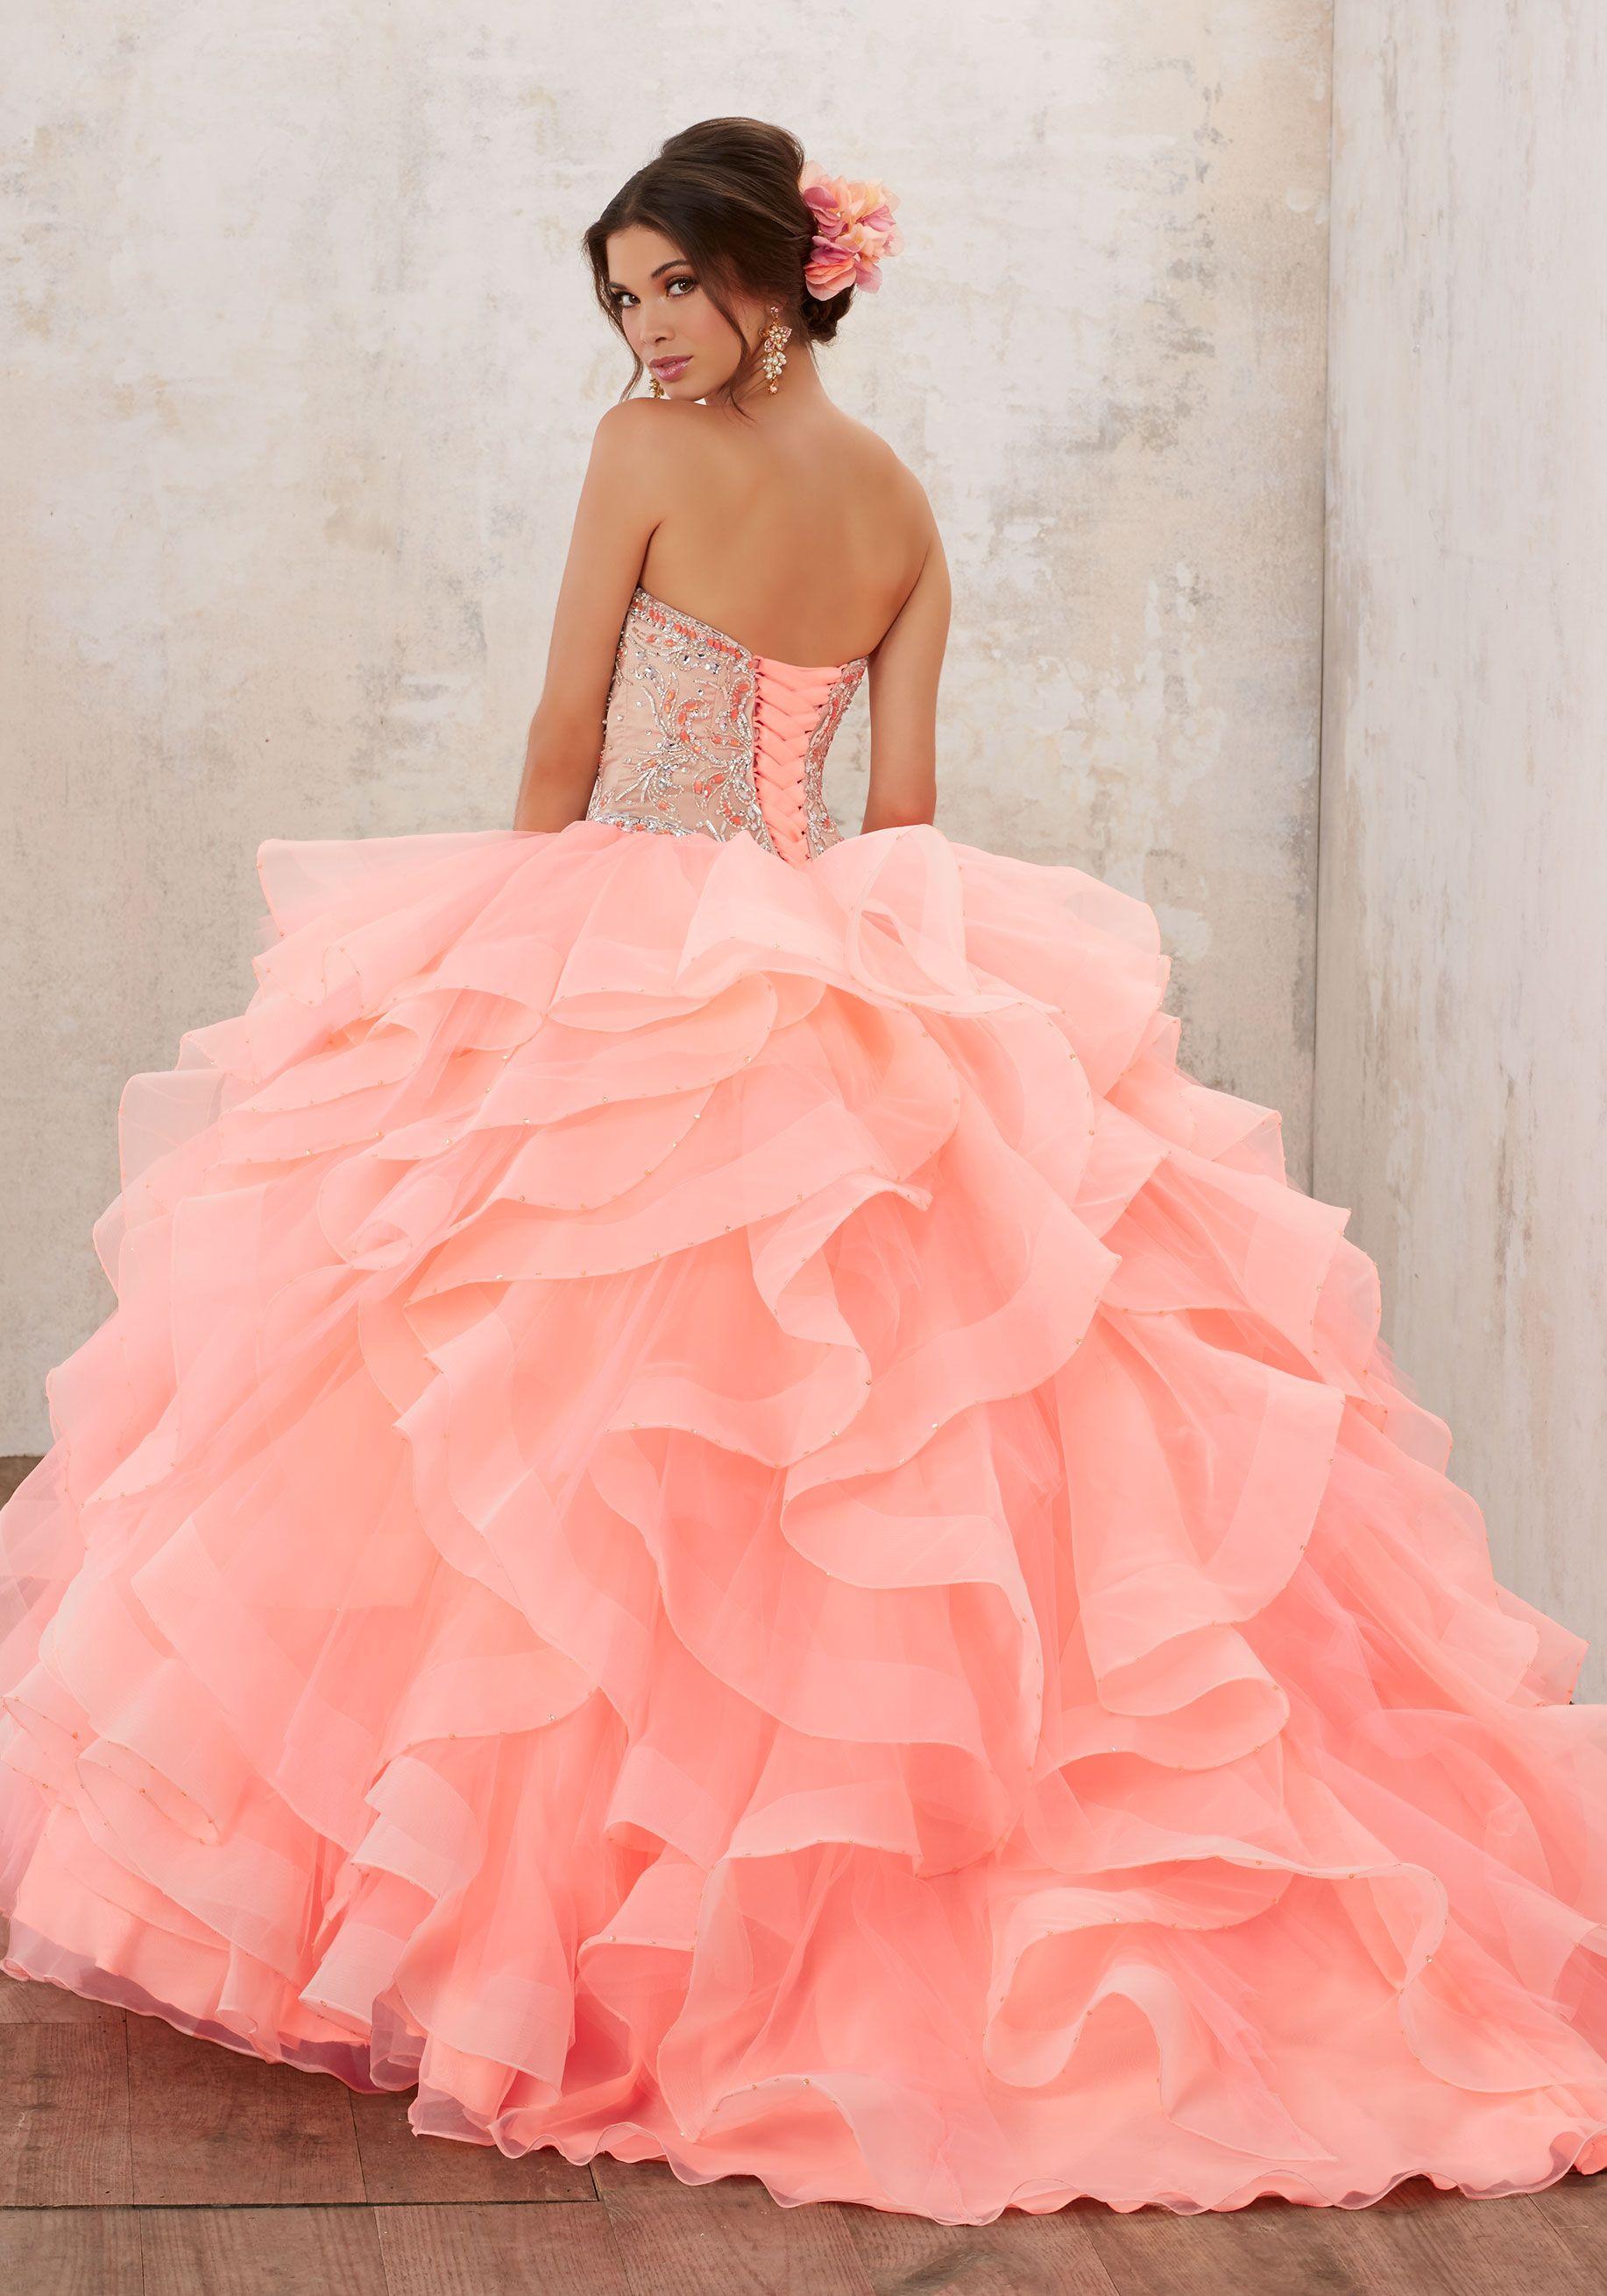 Classic Quinceañera Ballgown Combines a Stunning Jewel Beaded ...